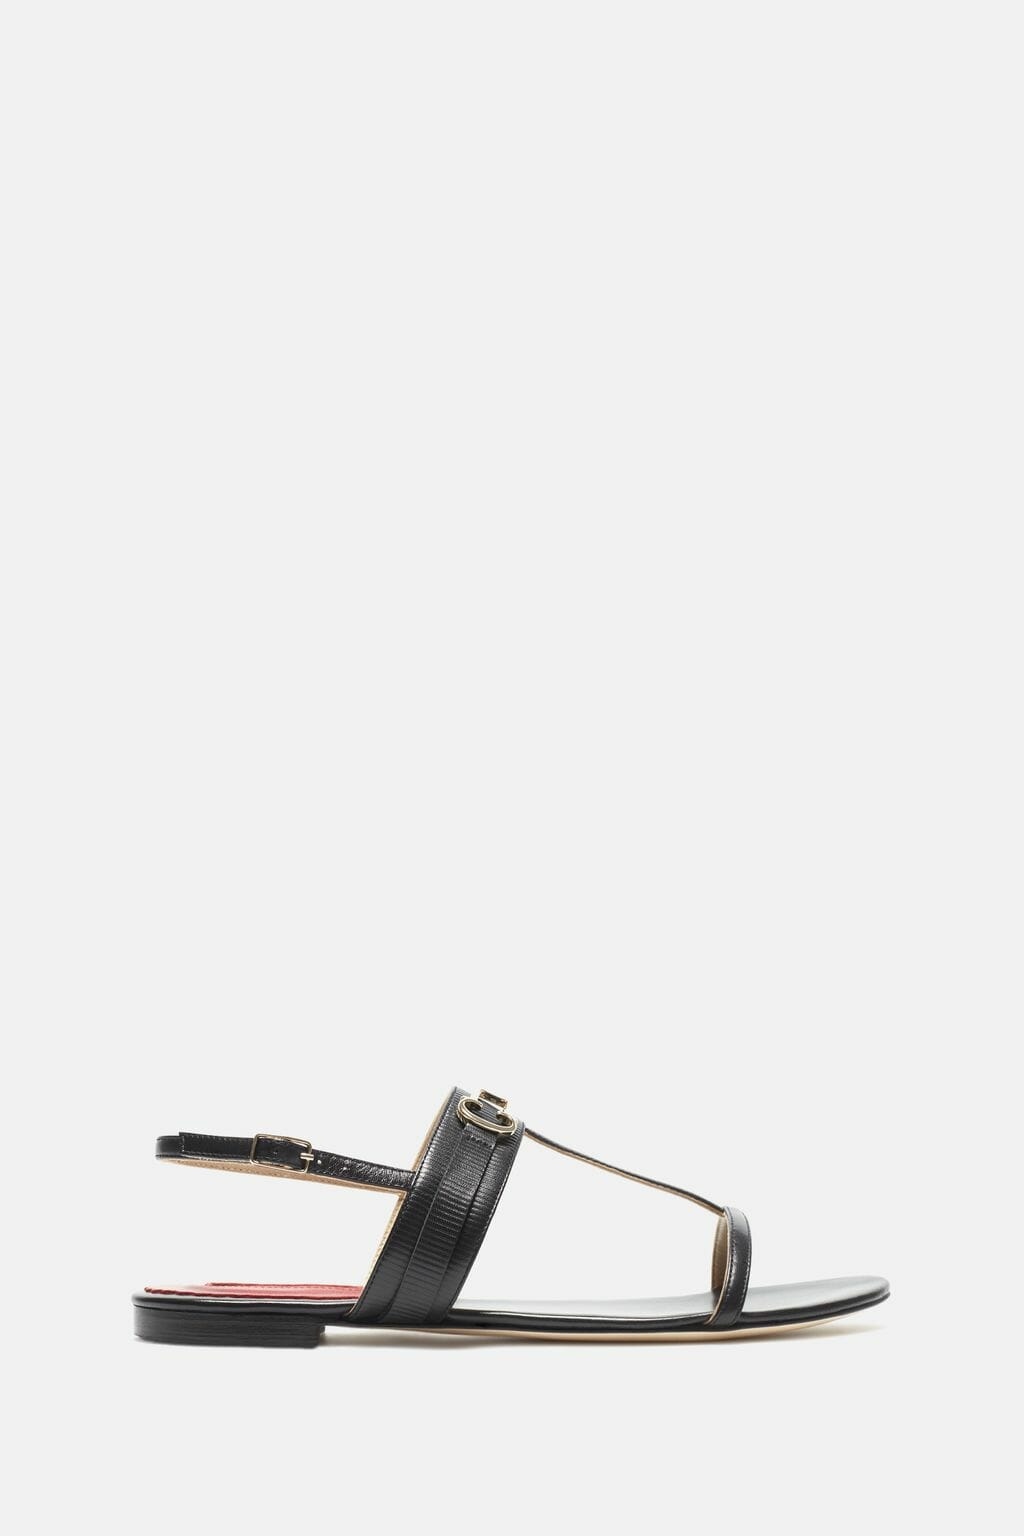 CH-Carolina-herrera-shoes-collection-Spring-Summer-2018-shoe-41